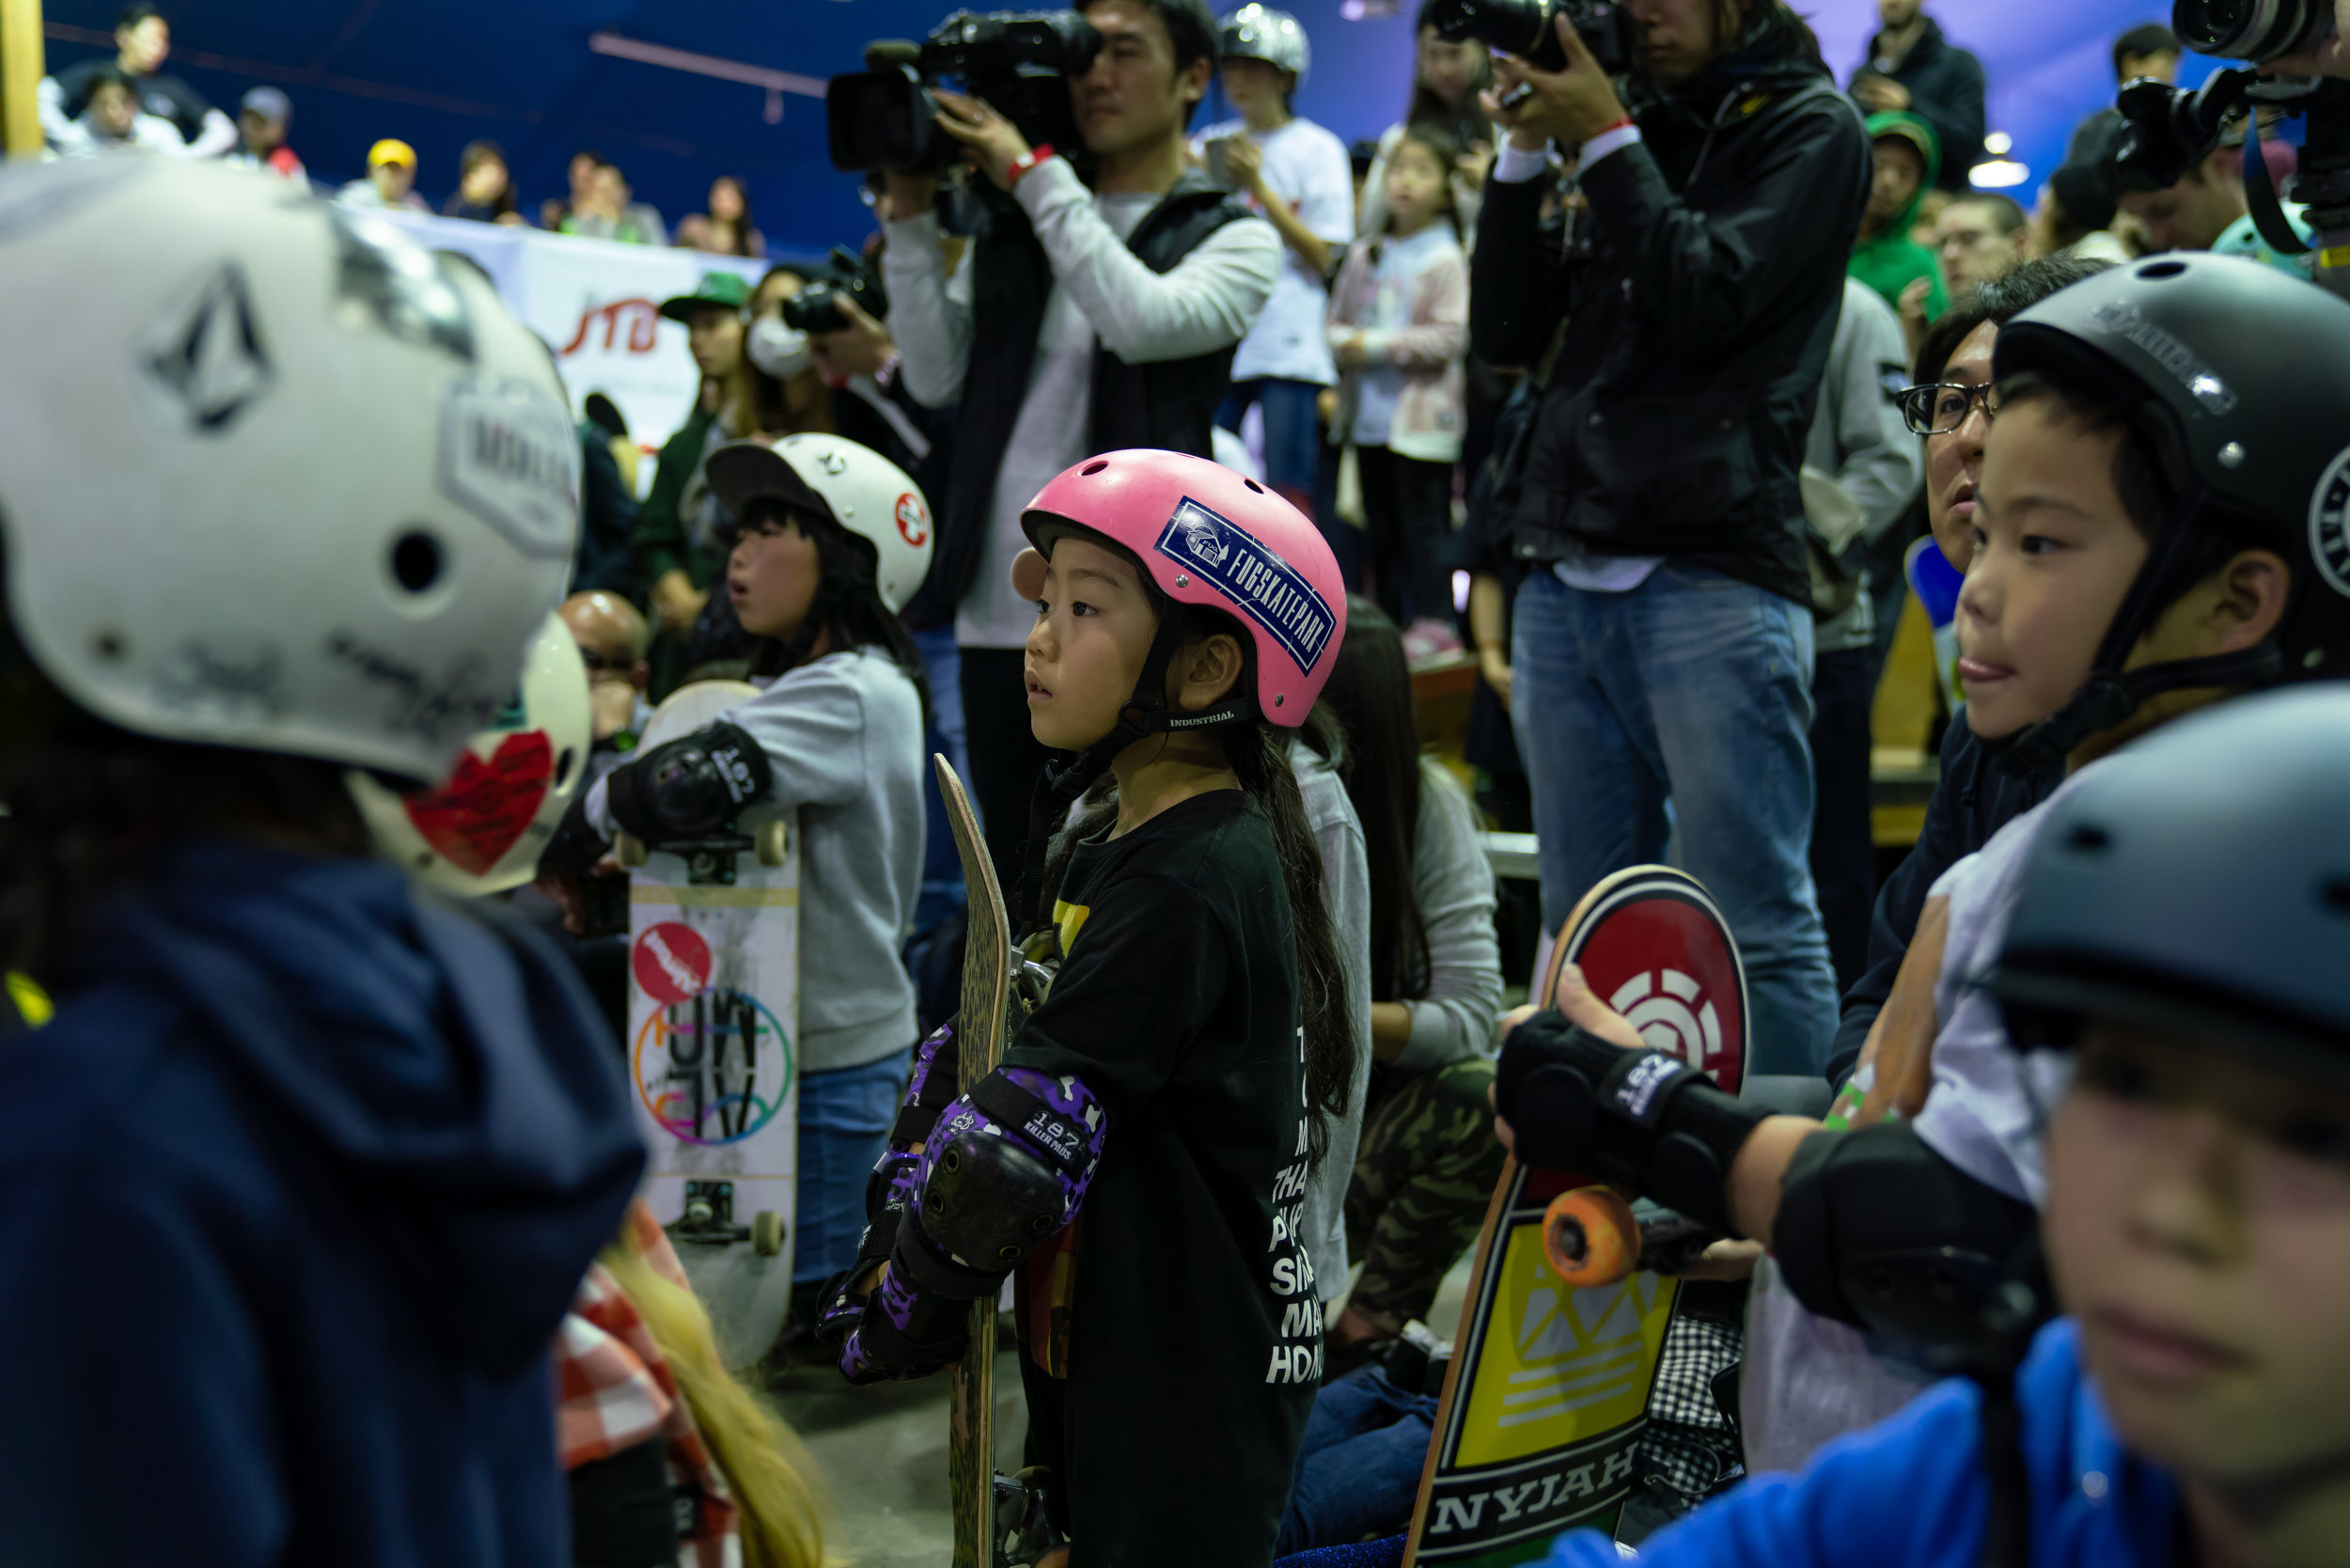 Skate Exchange3_Event Day Japan 2018_hannah bailey00012.jpg